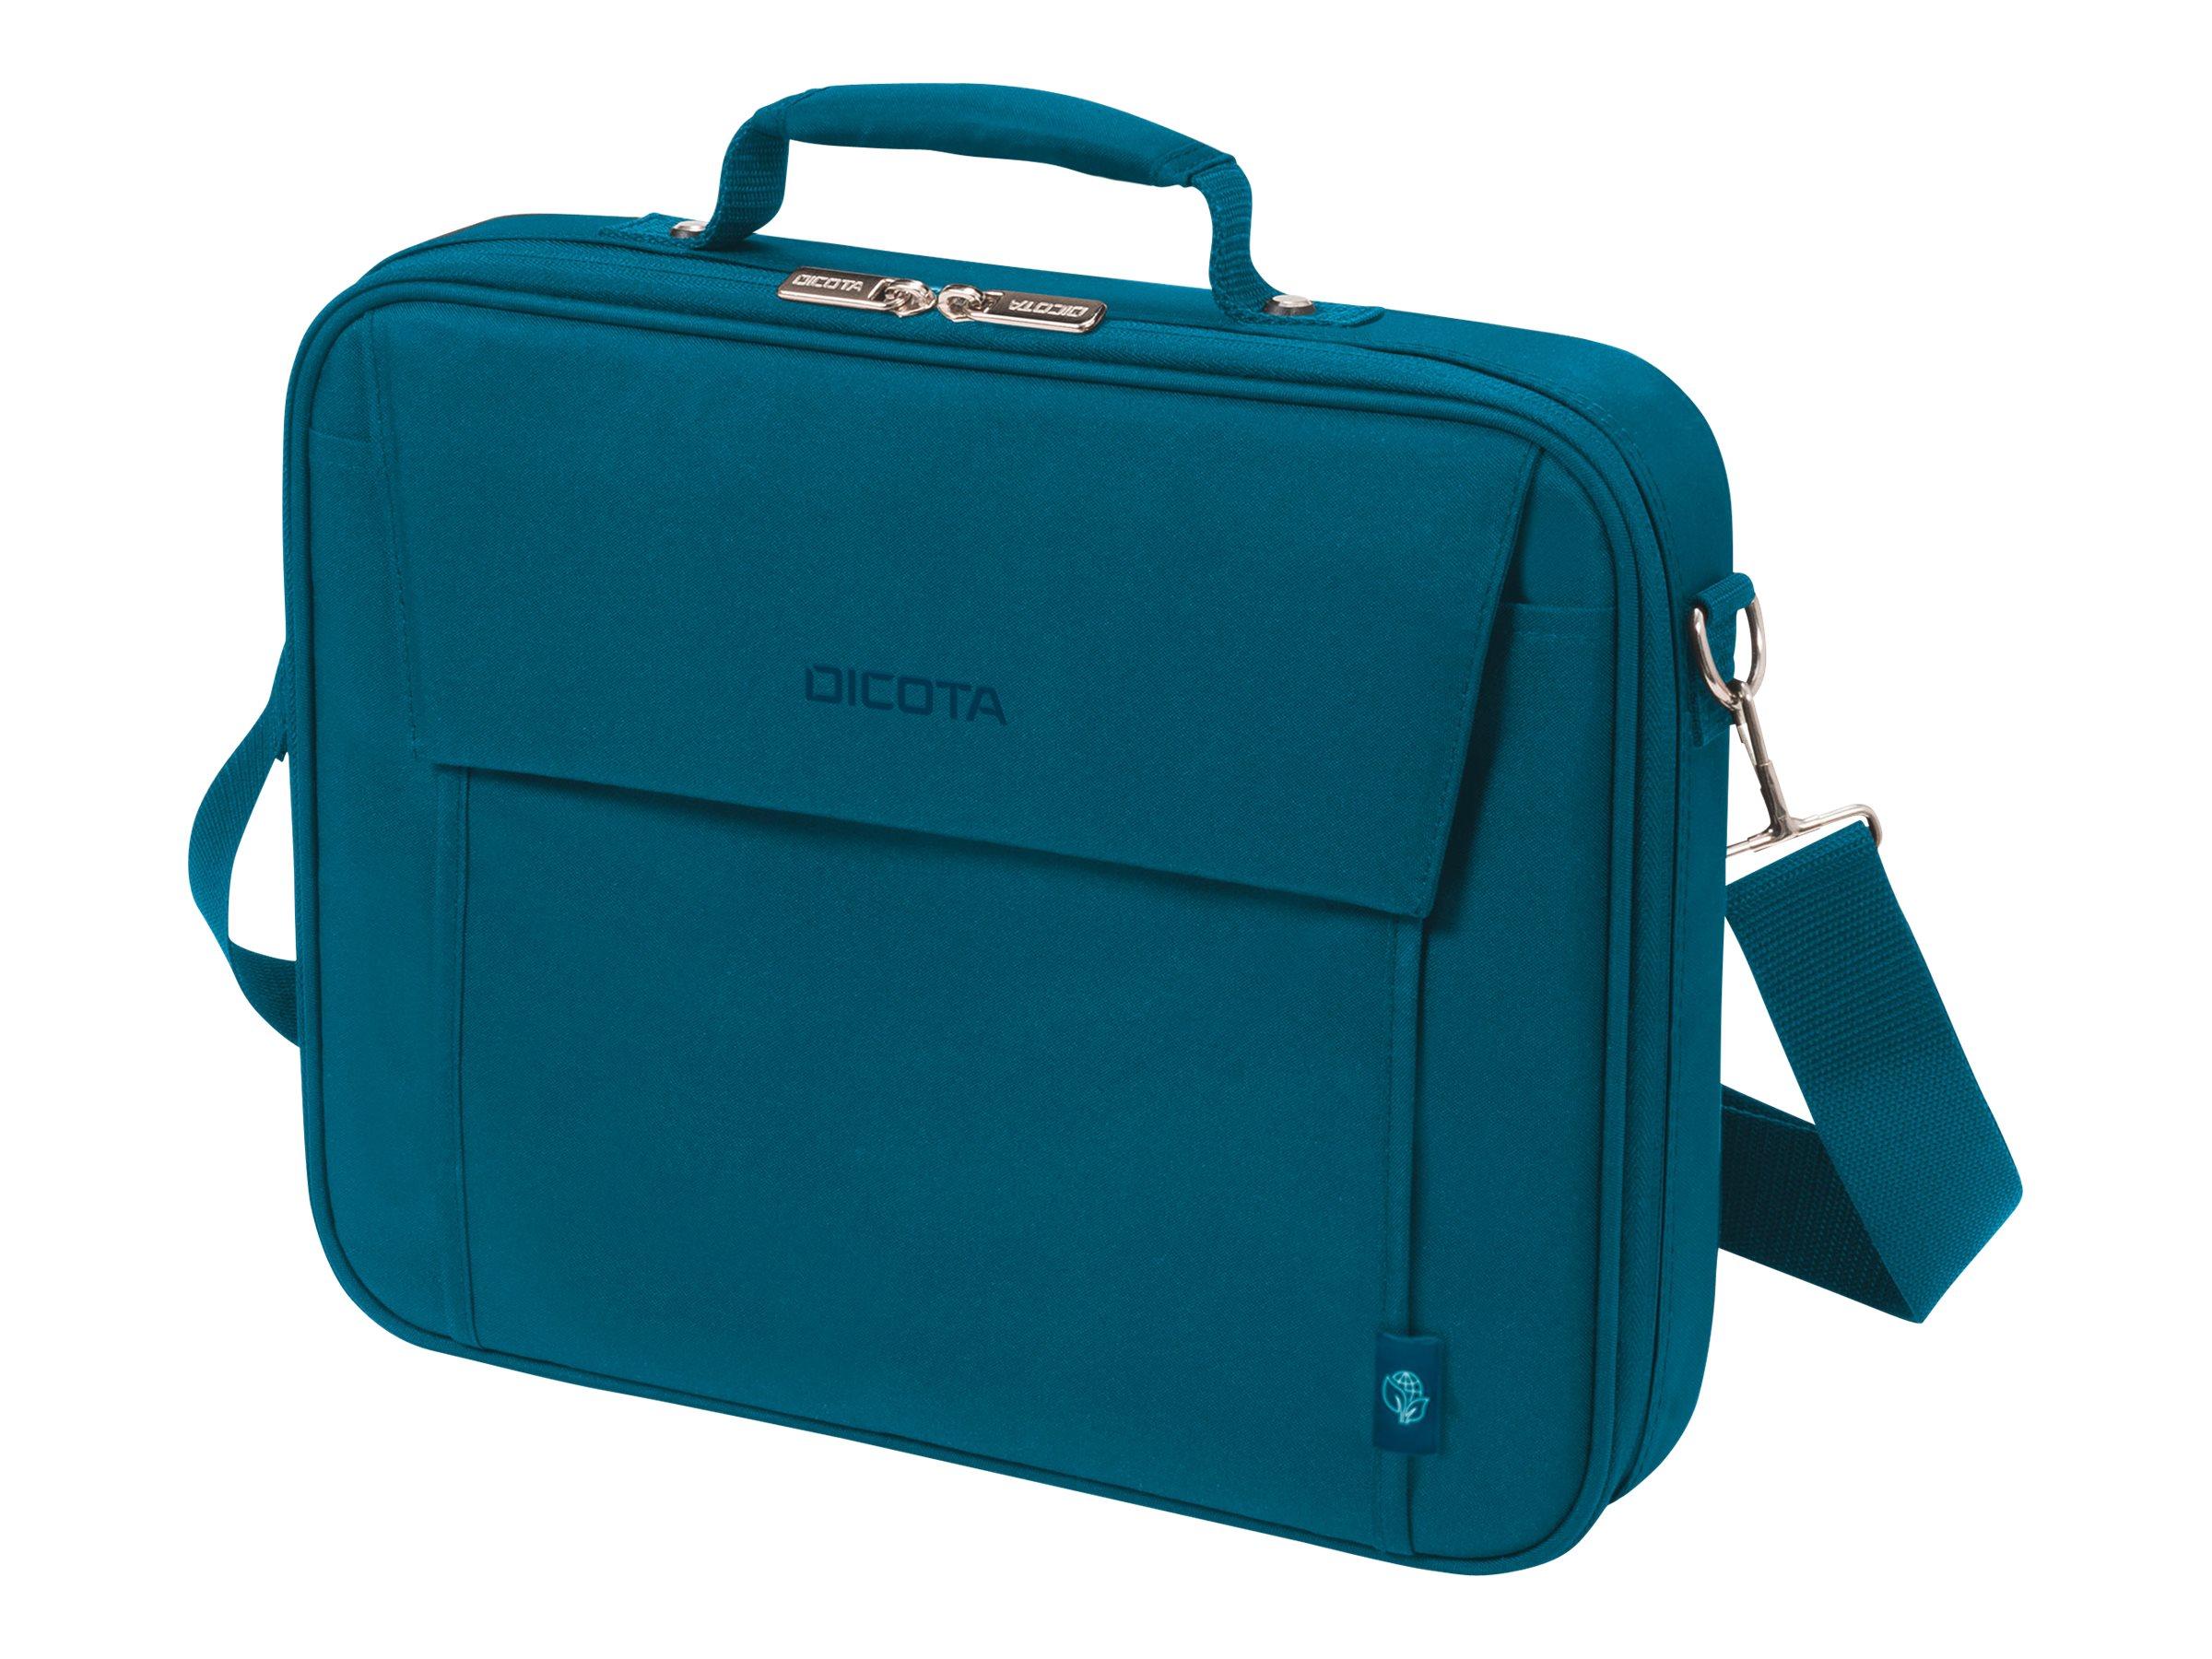 DICOTA Eco Multi BASE - Notebook-Tasche - 39.6 cm - 14